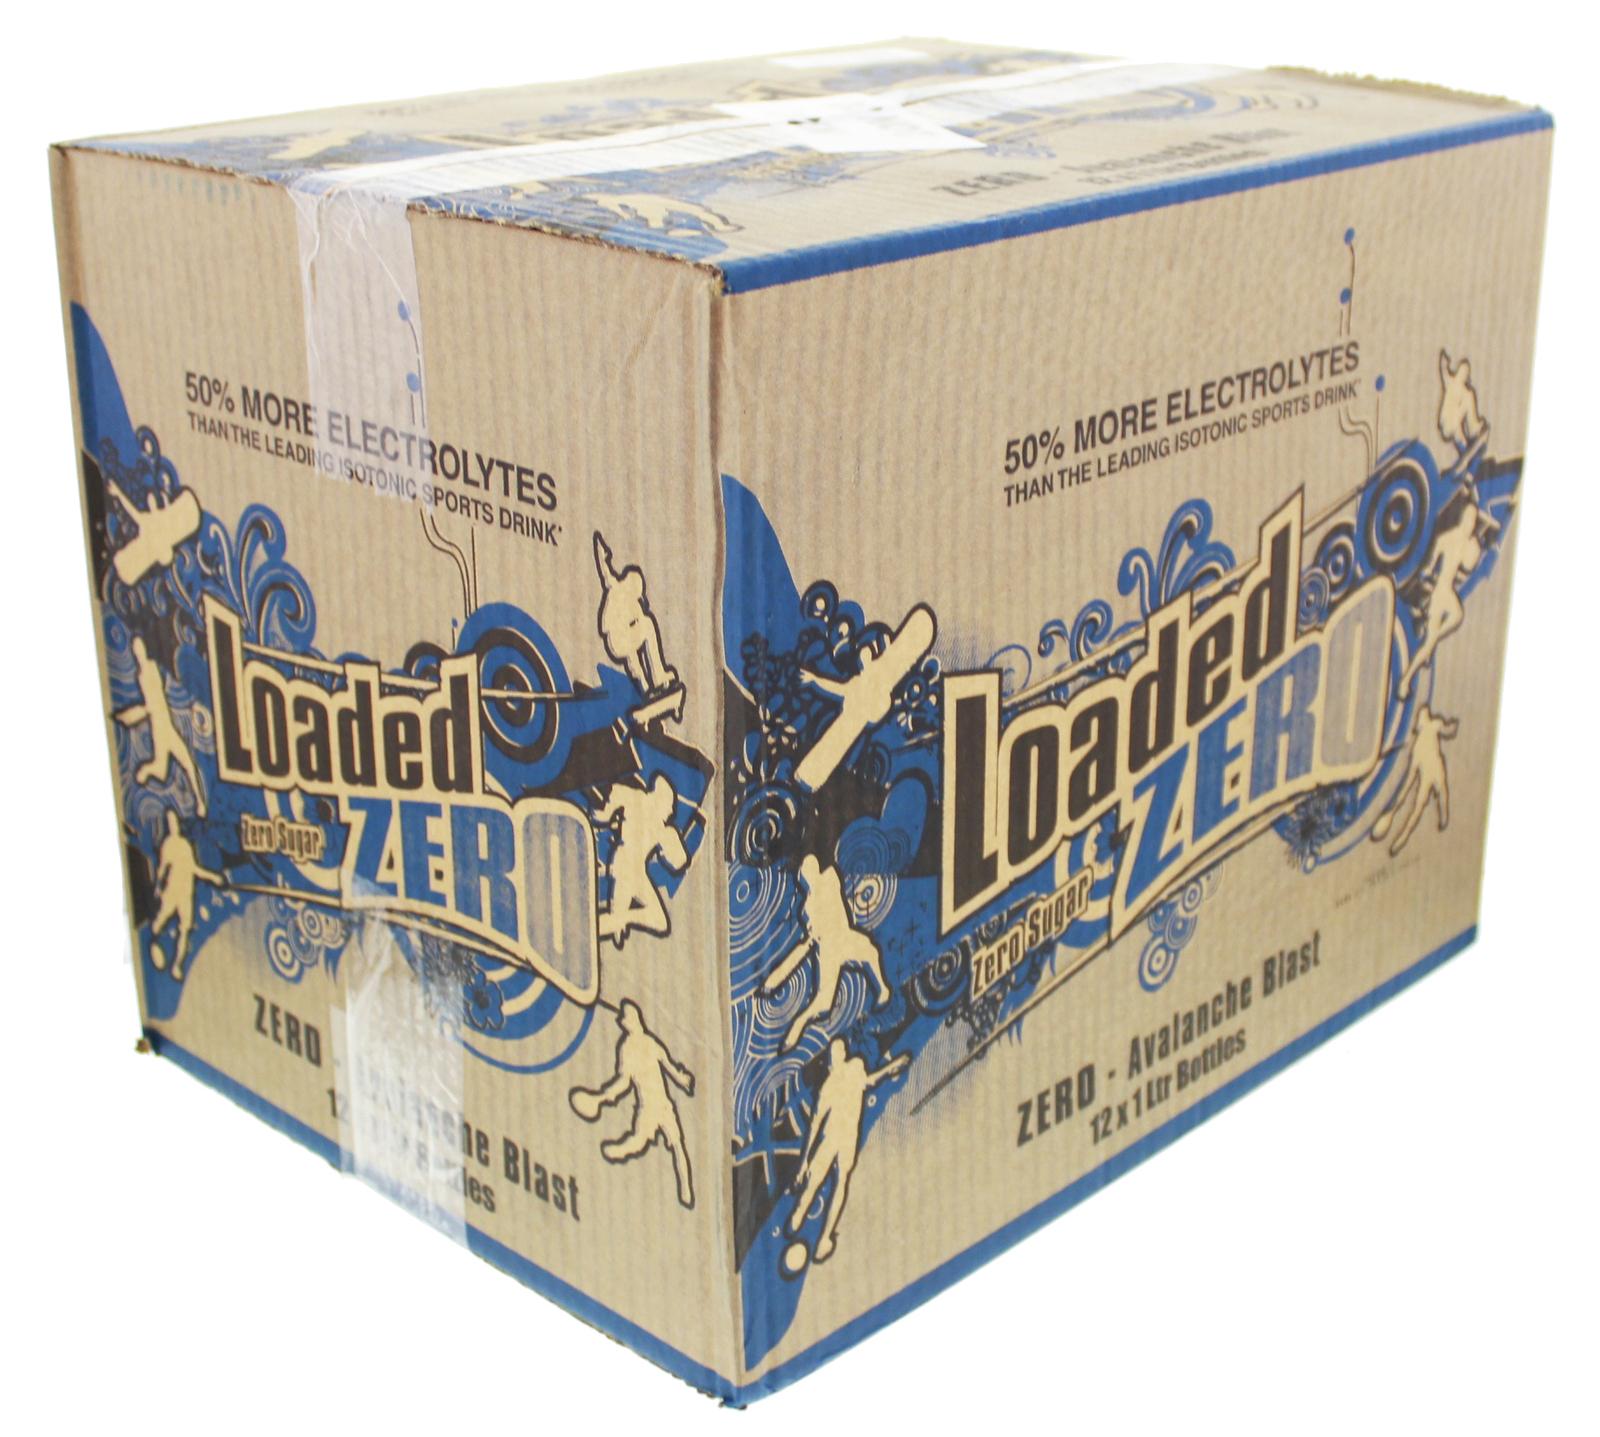 Loaded Sports Drink - Zero Avalanche Blast (1L) image